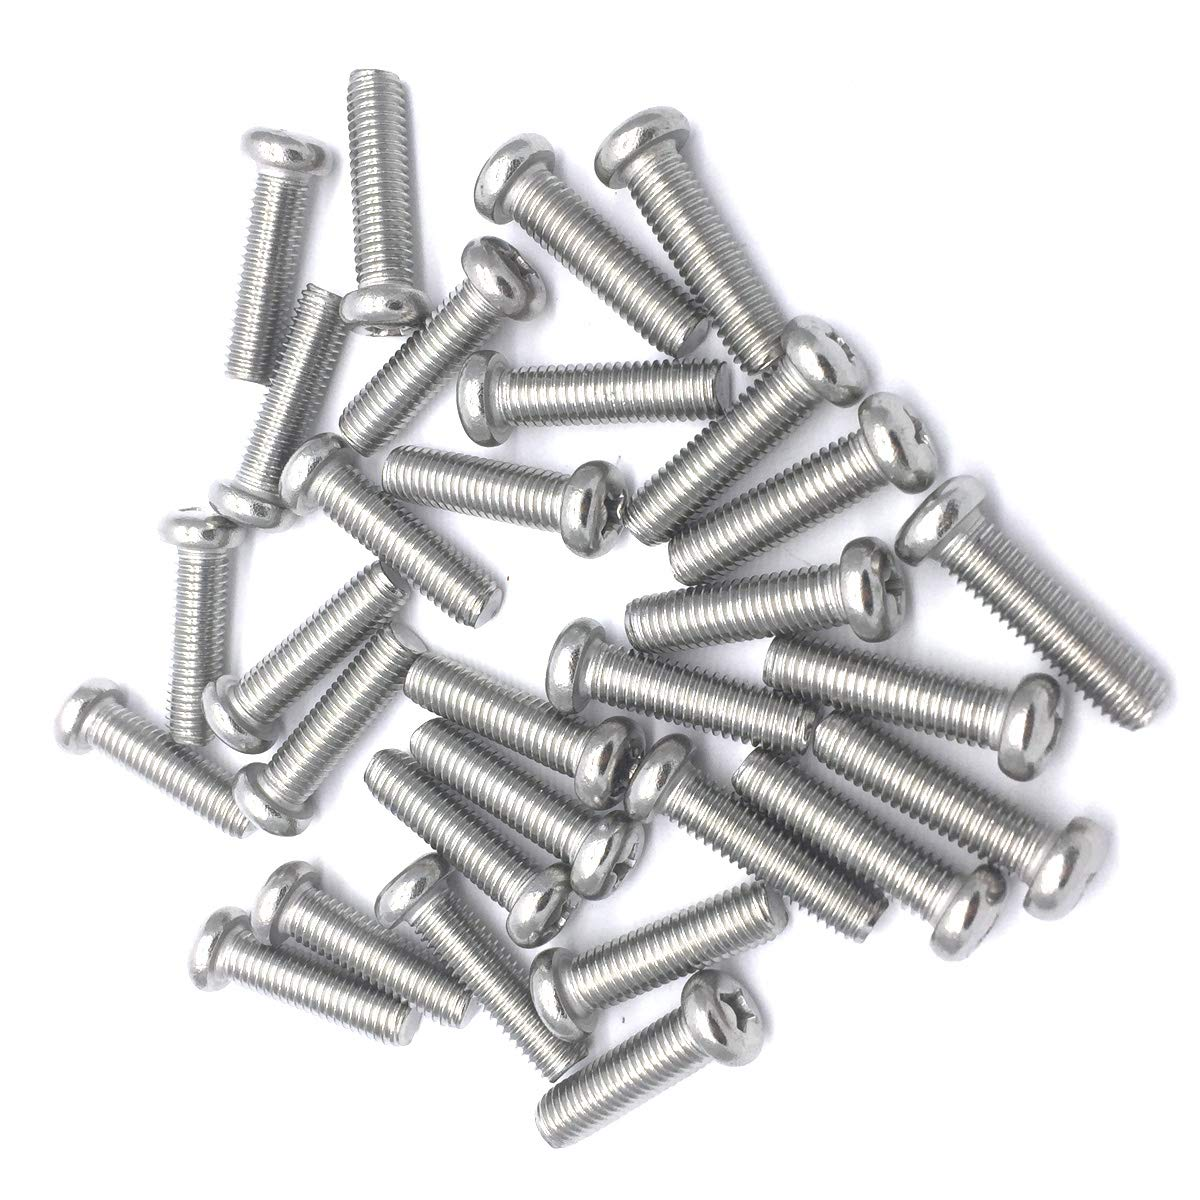 Thread Size M8-1.25 FastenerParts Precision Shoulder Screw 18-8 Stainless Steel